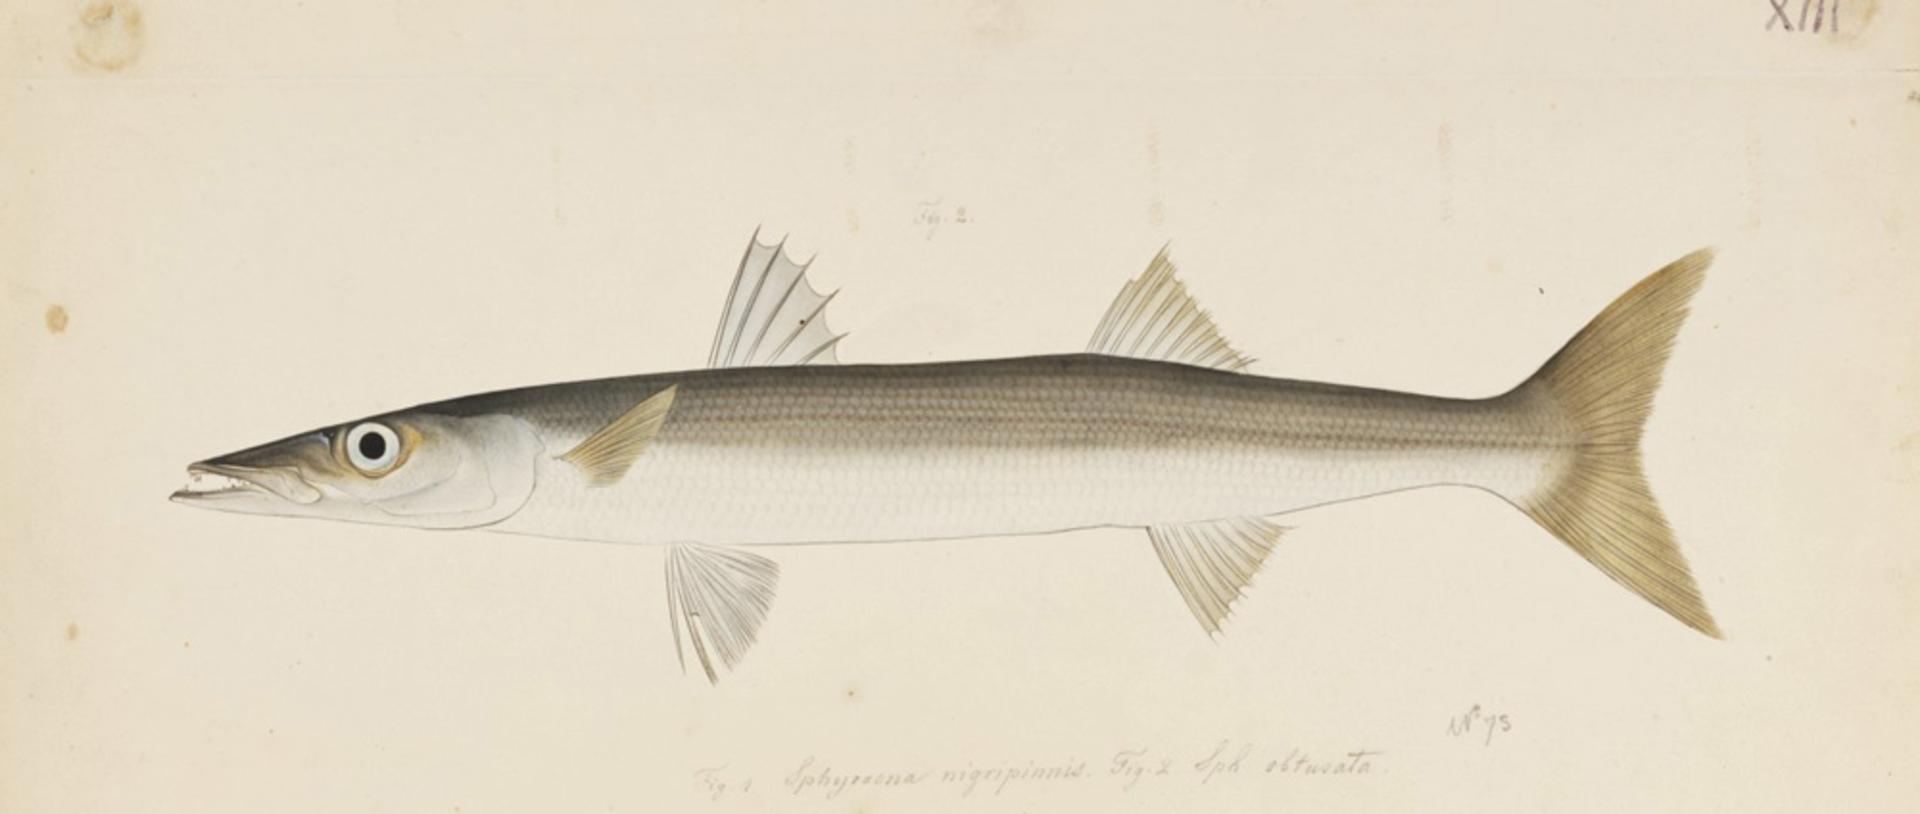 RMNH.ART.195   Sphyraena pinguis